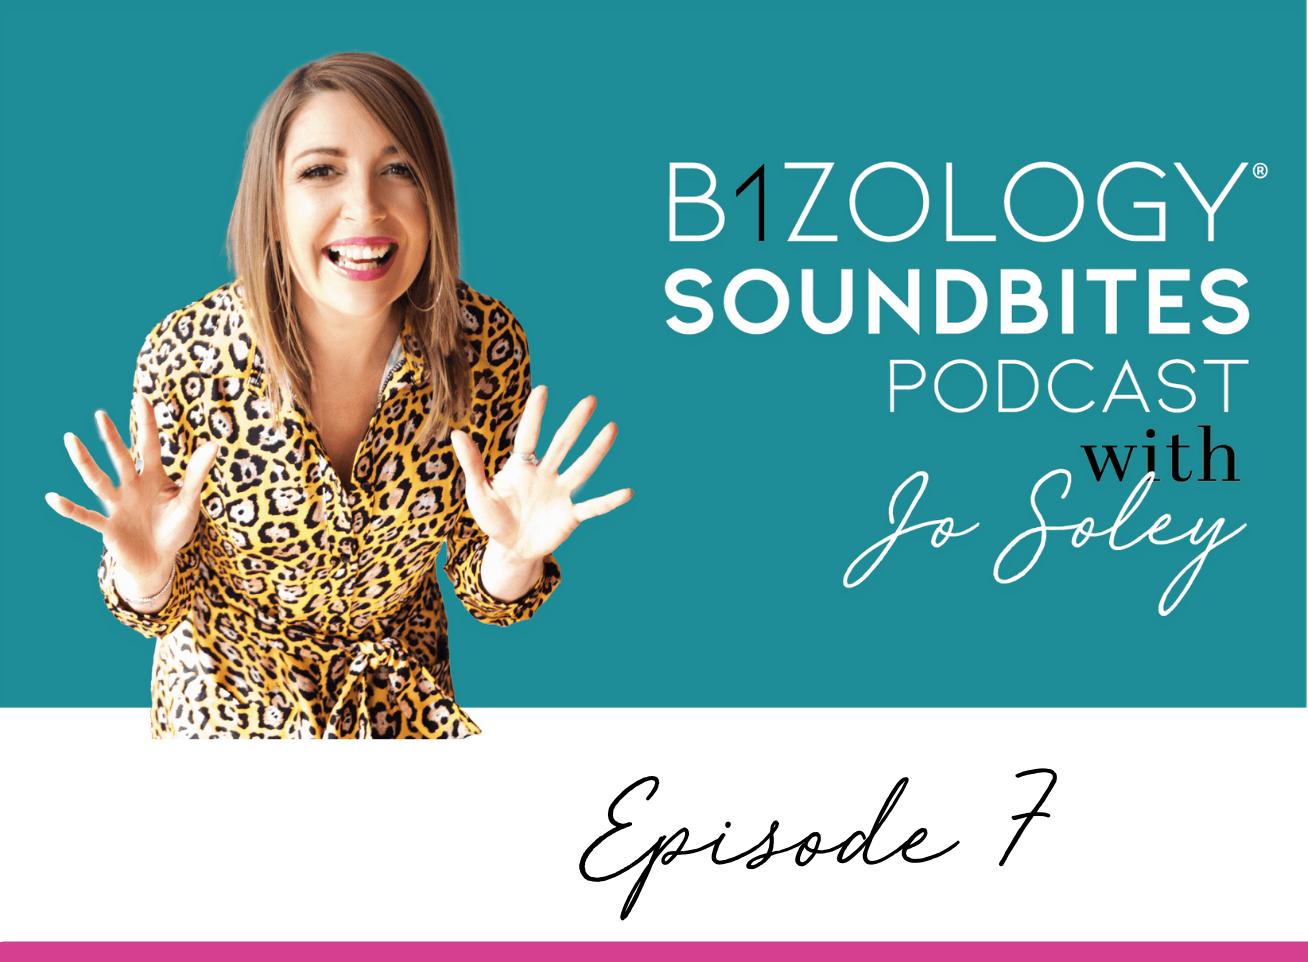 Bizology Soundbites Podcast